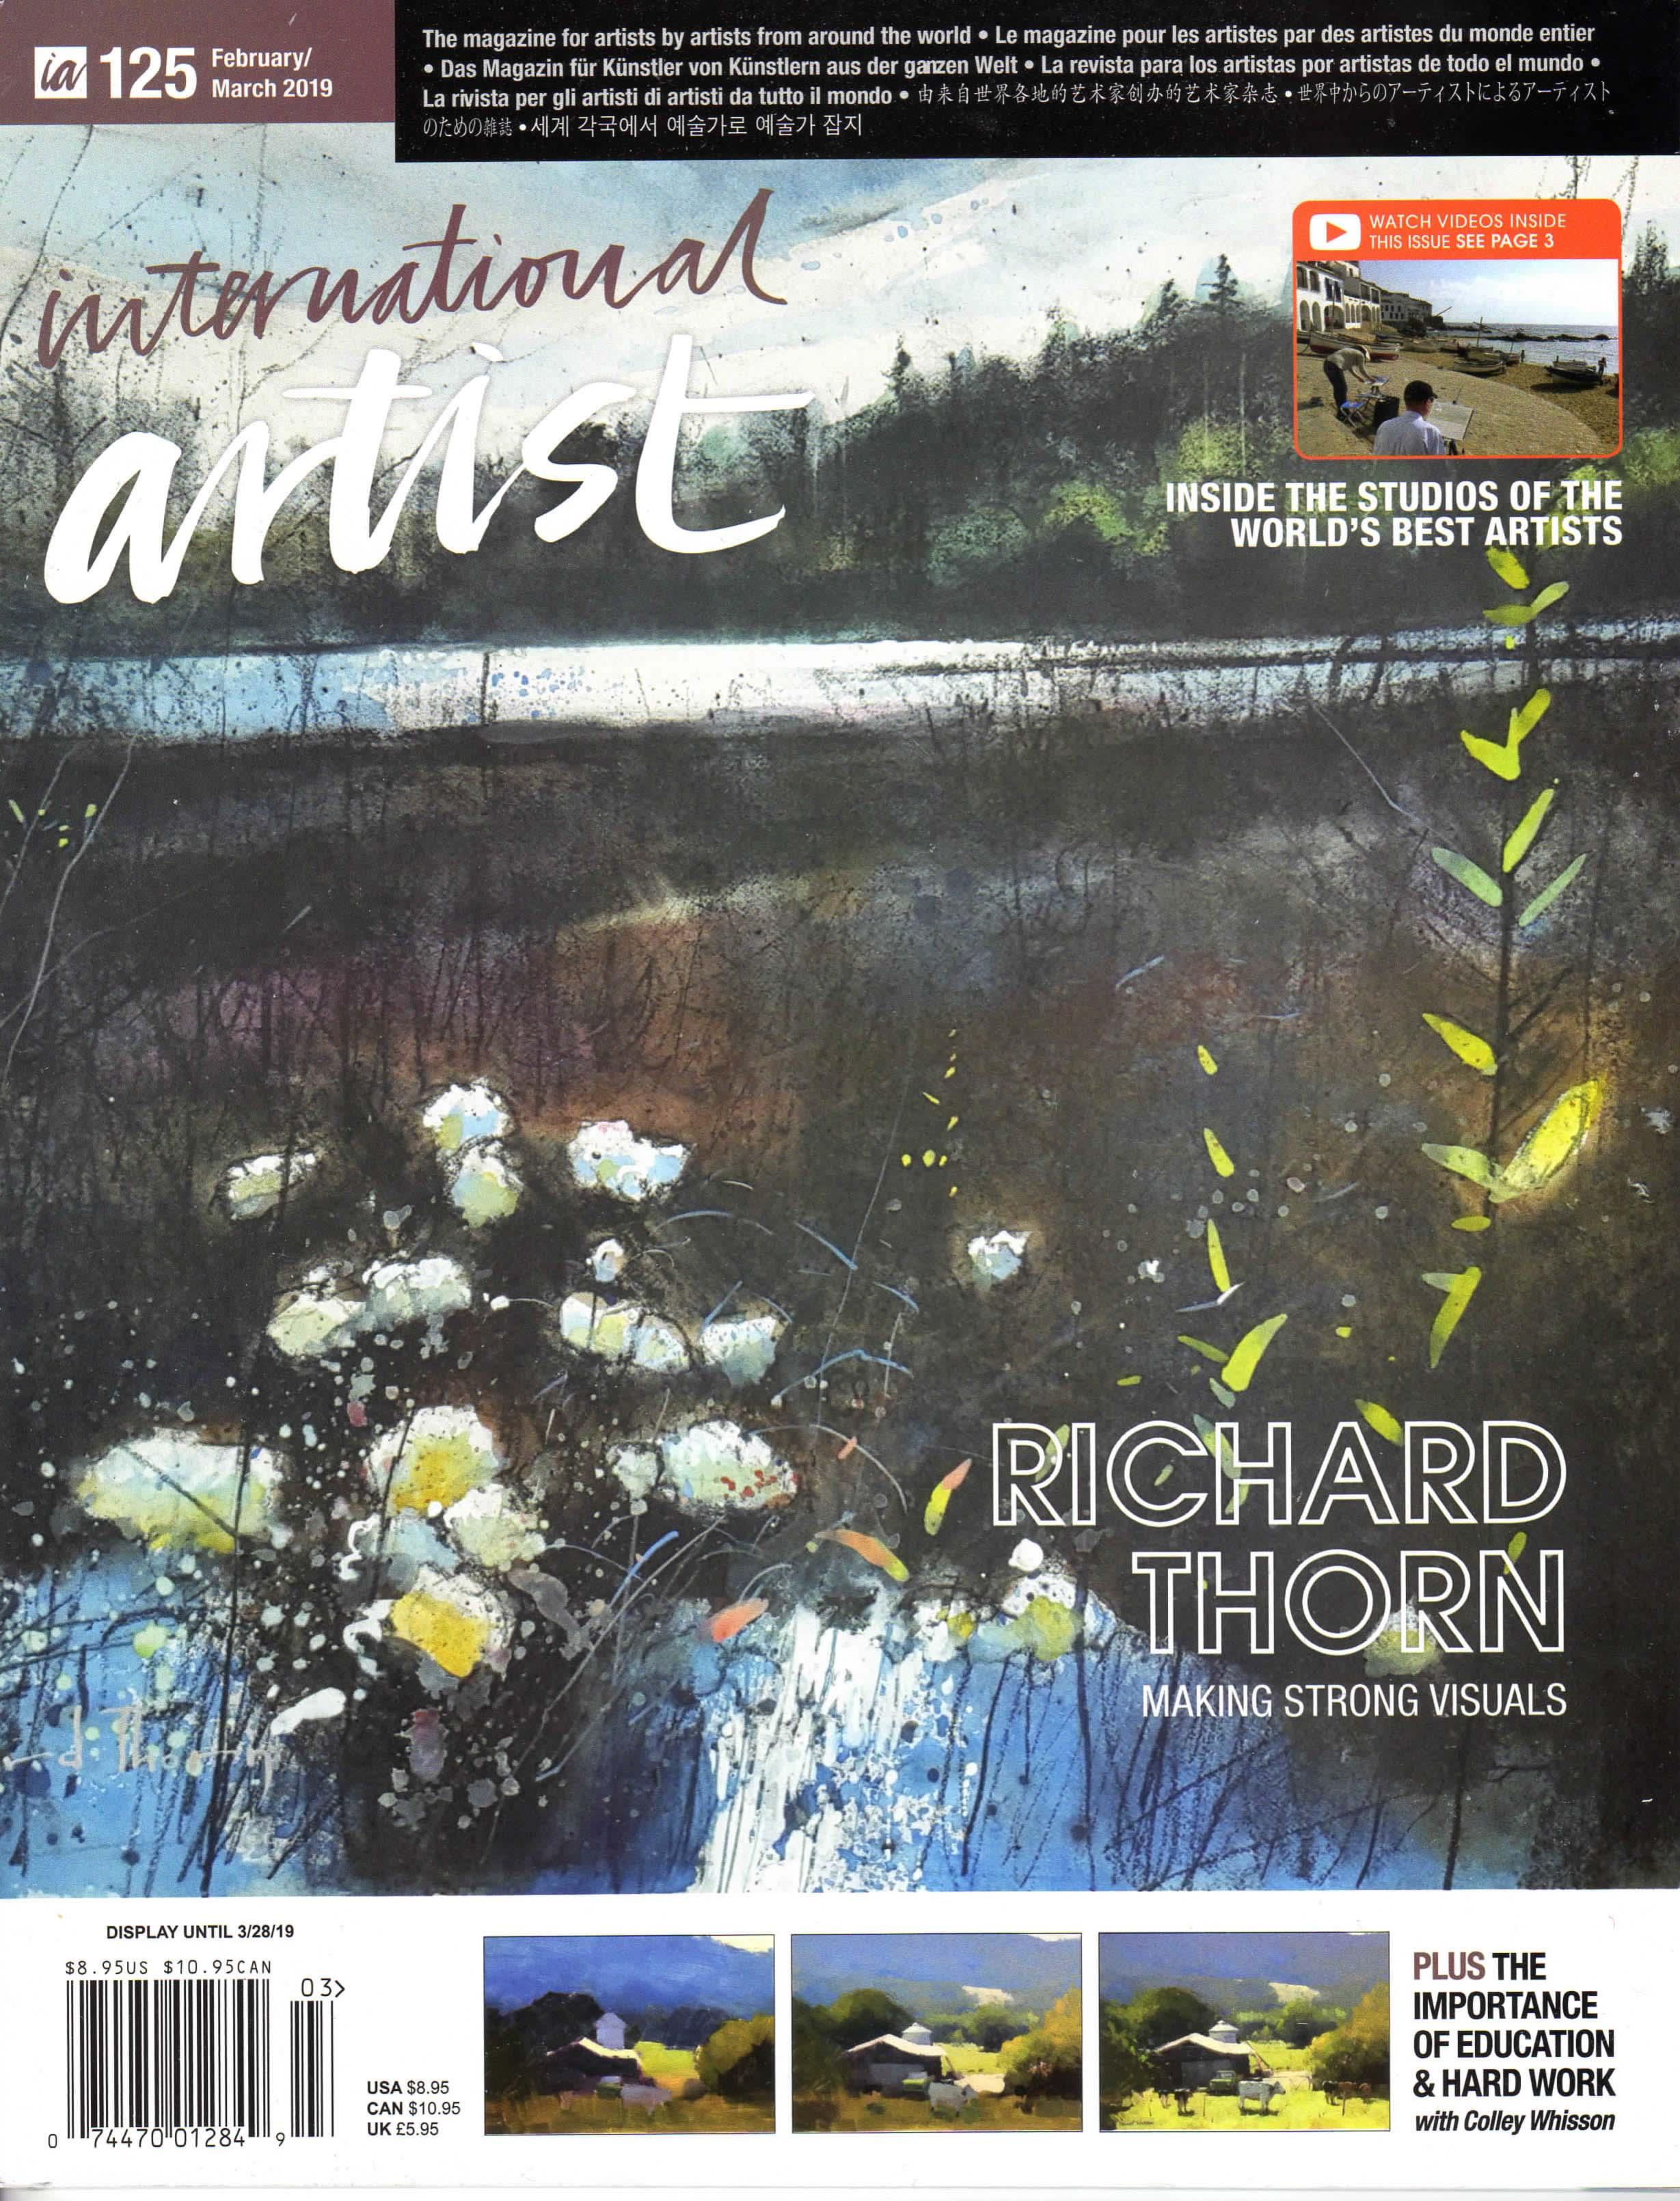 COVER - INTERNATIONAL ARTIST - FLORAL AWARD034.jpg